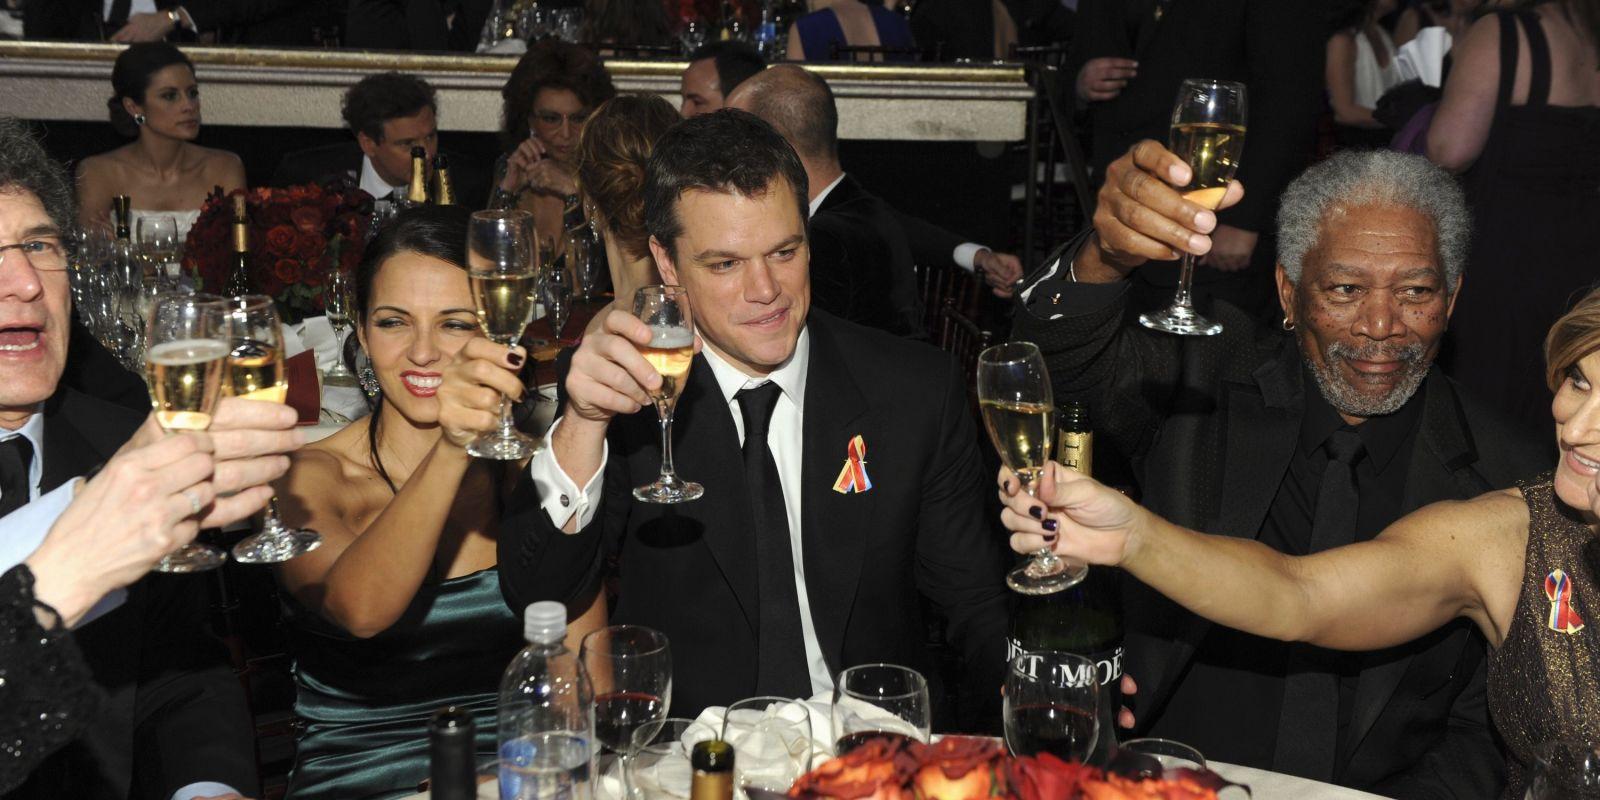 Drunk Celebrities At The Golden Globes Drunk Acceptance Speeches